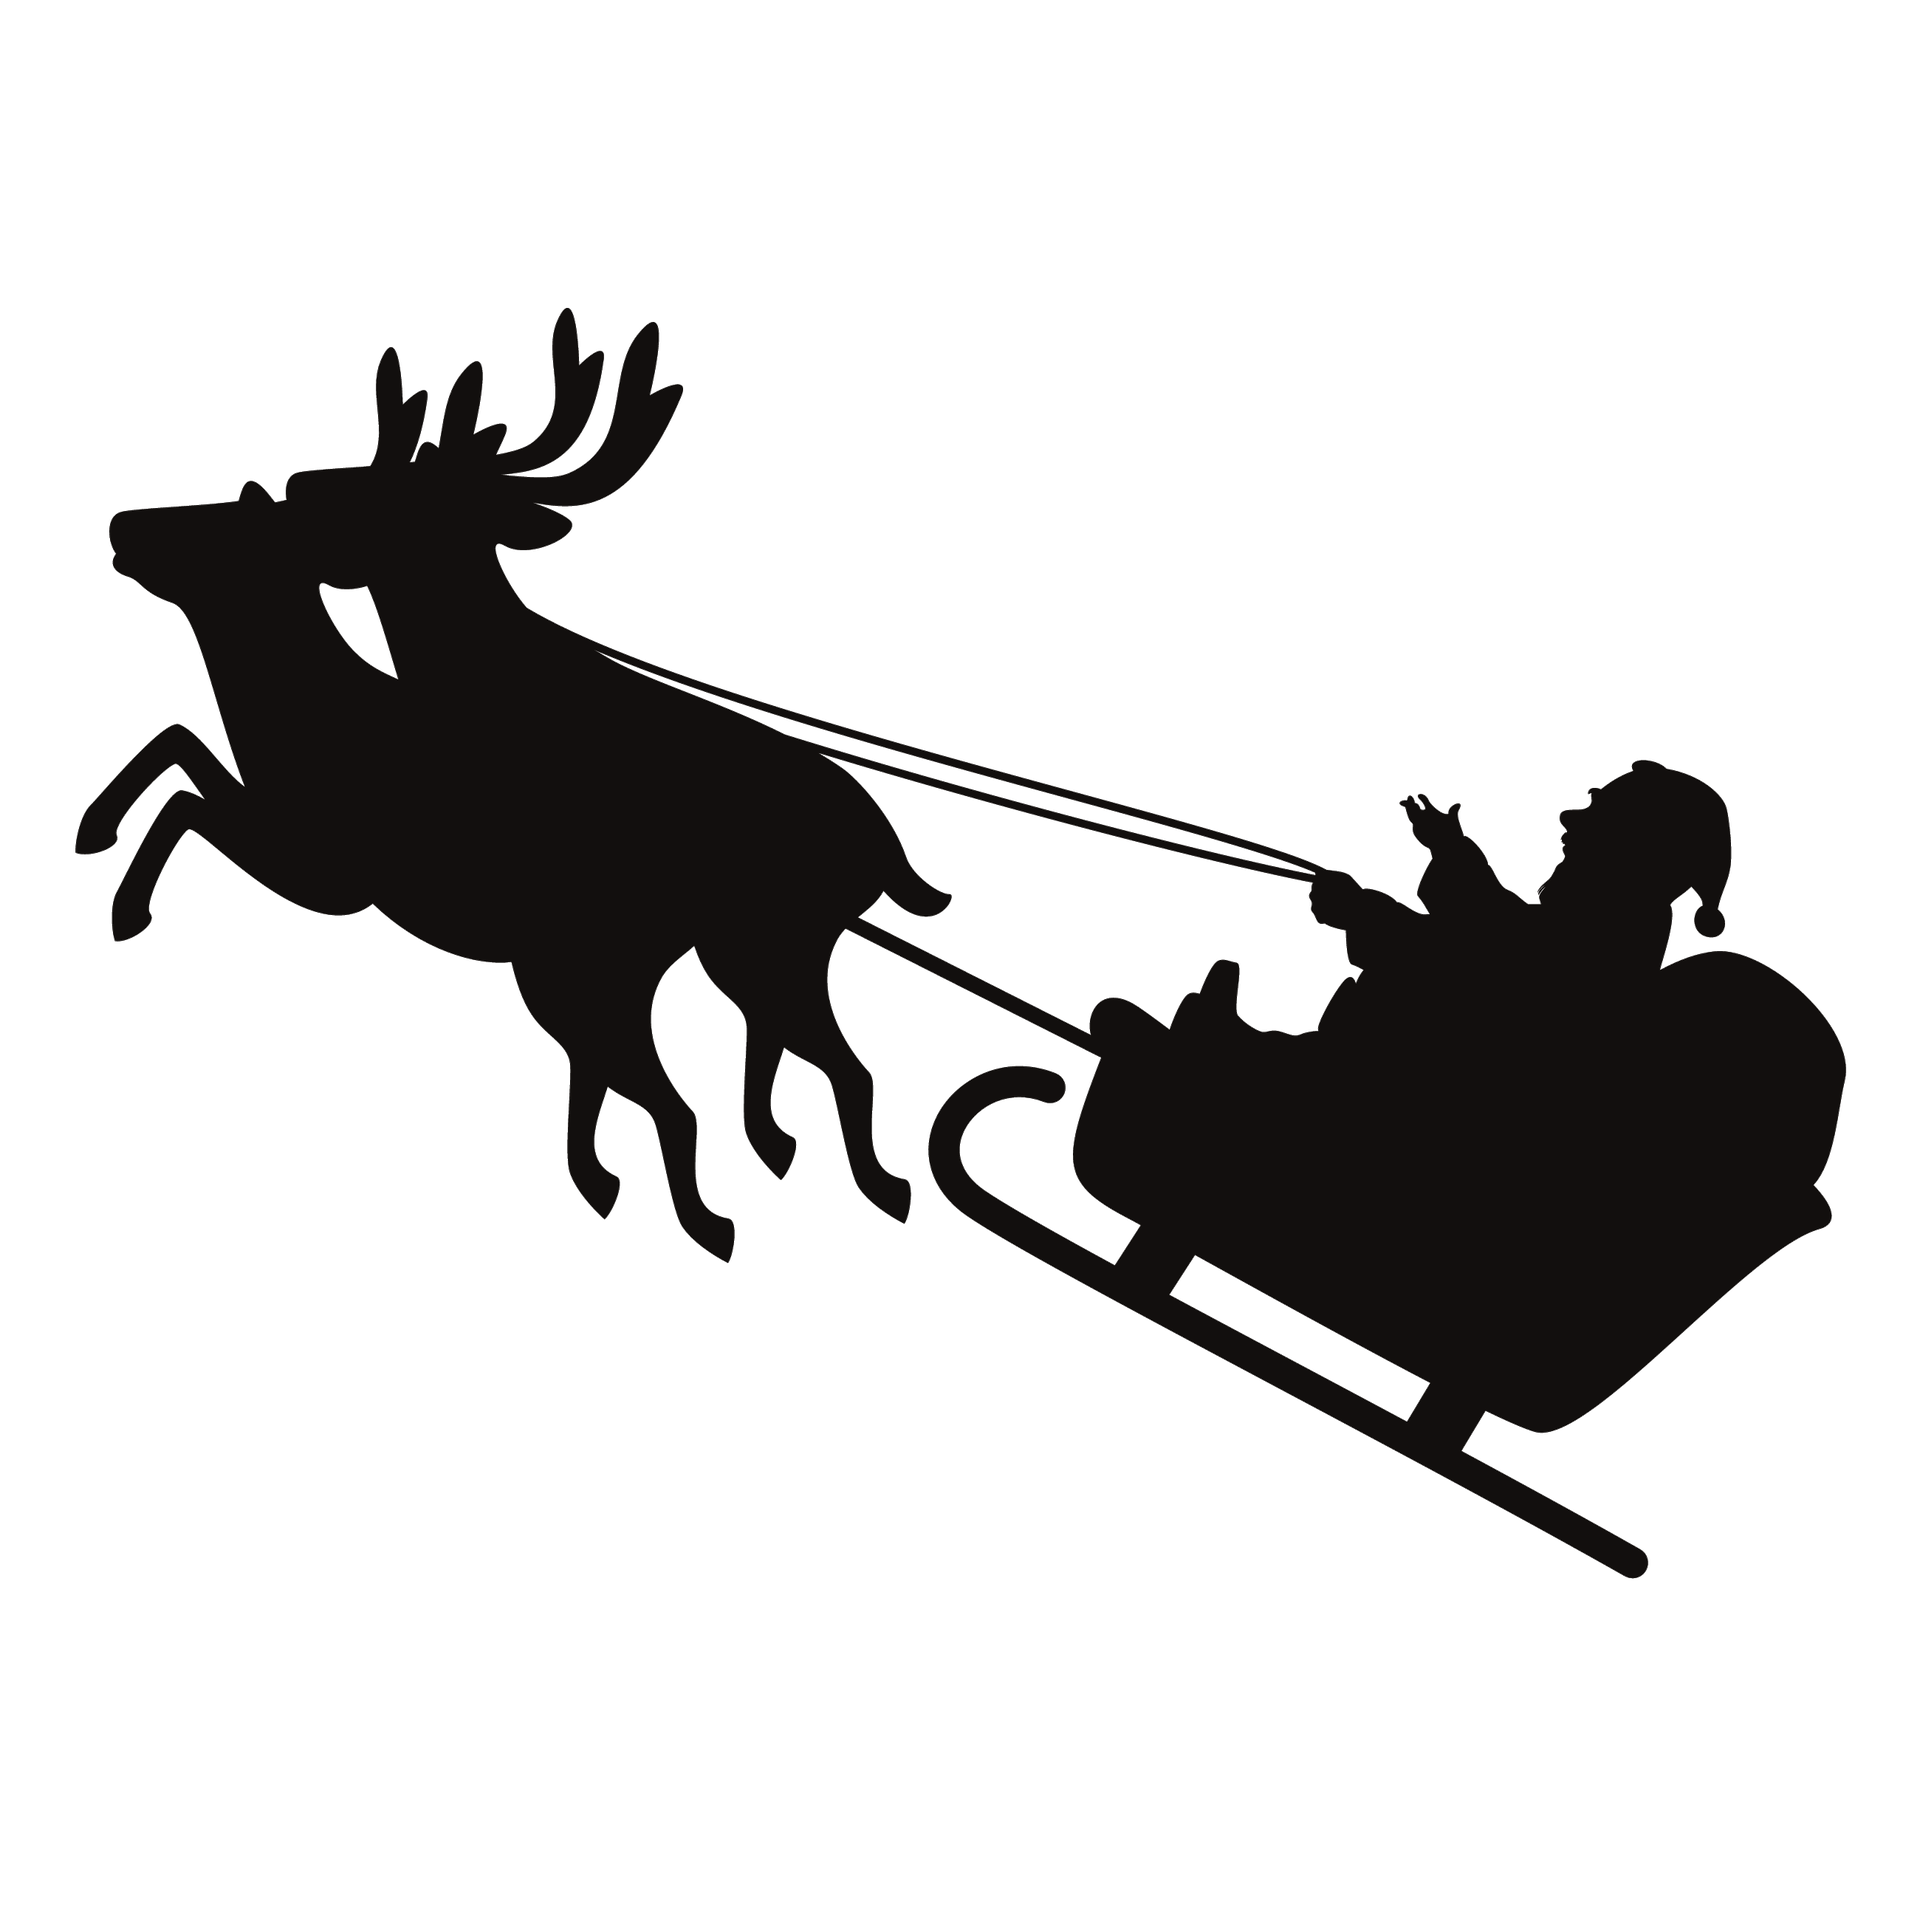 Christmas santaclaus reindeer icon. Clipart present silhouette